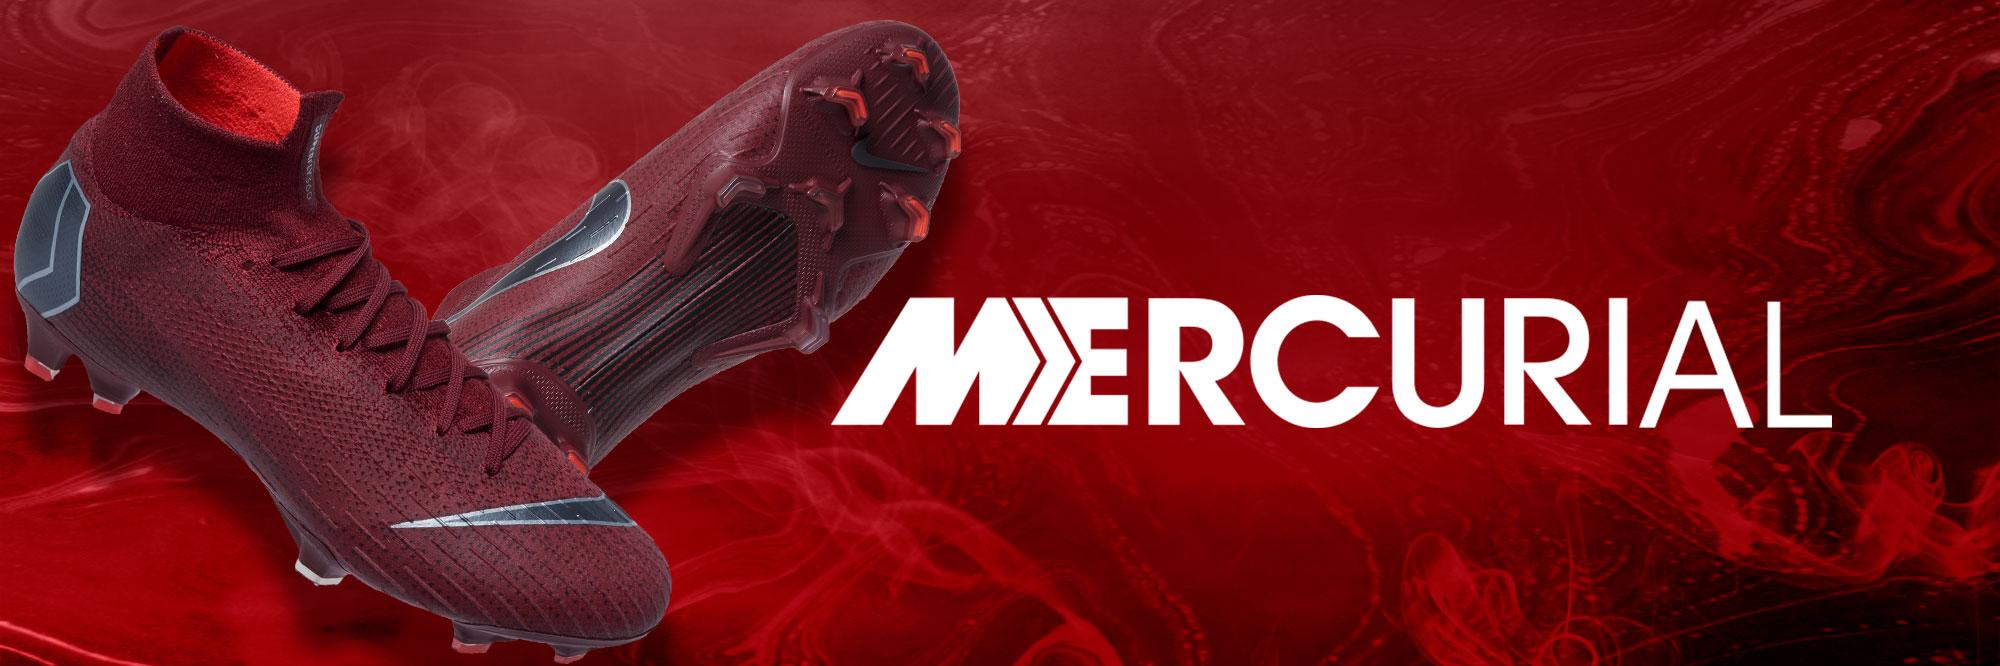 ba2c99f5865445 Nike Mercurial Superfly